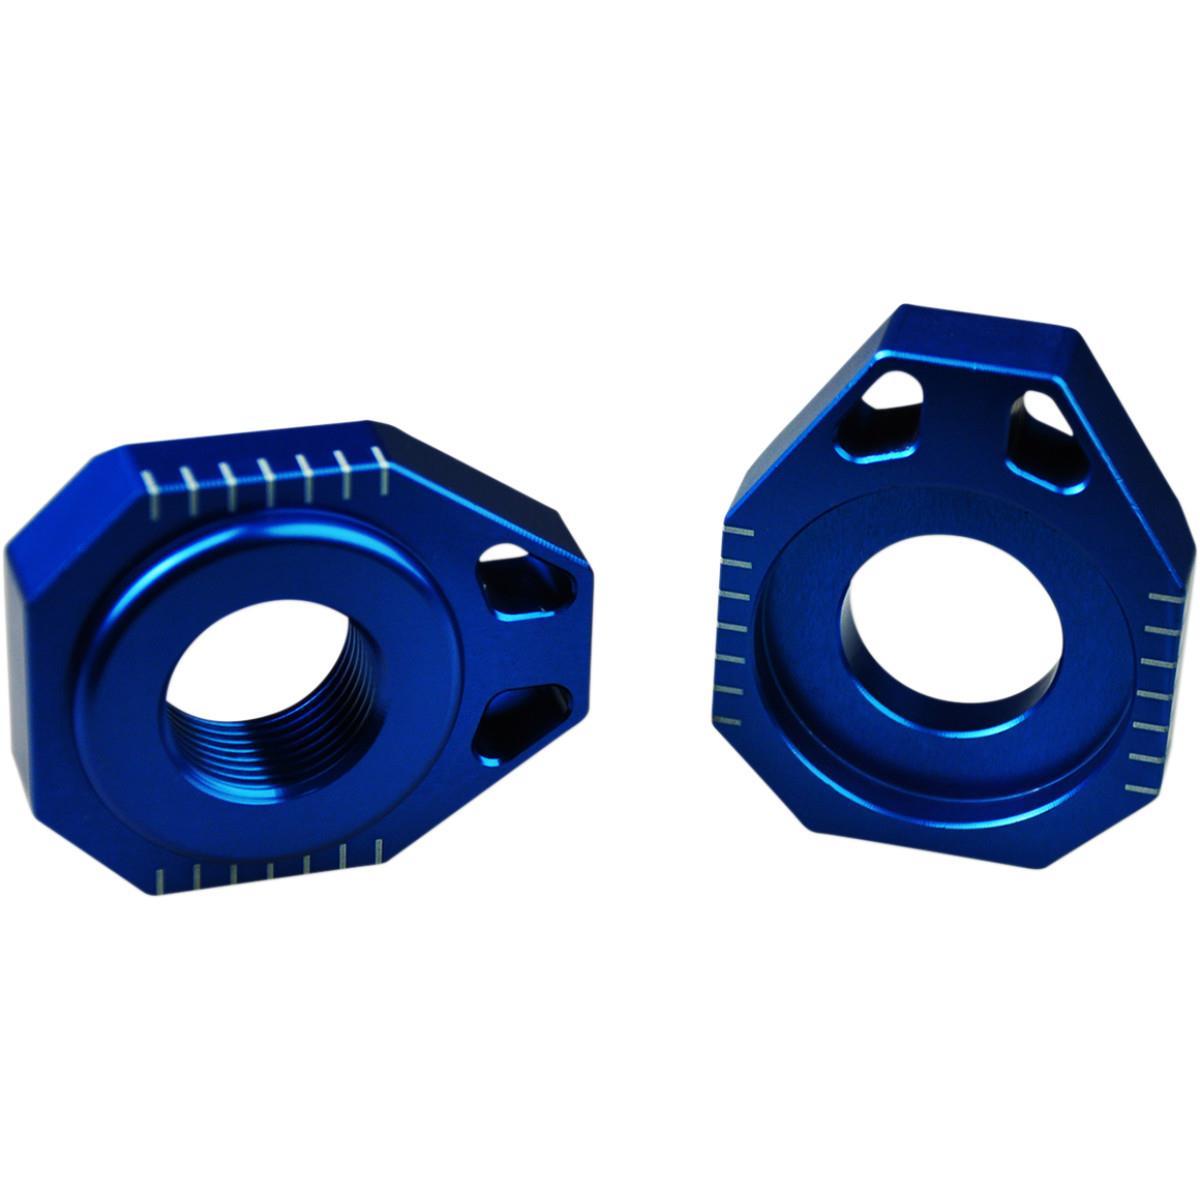 Axle blocks KTM EXC EXC-F SX Husqvarna TE TC FE FC - CNC Alluminium Blue